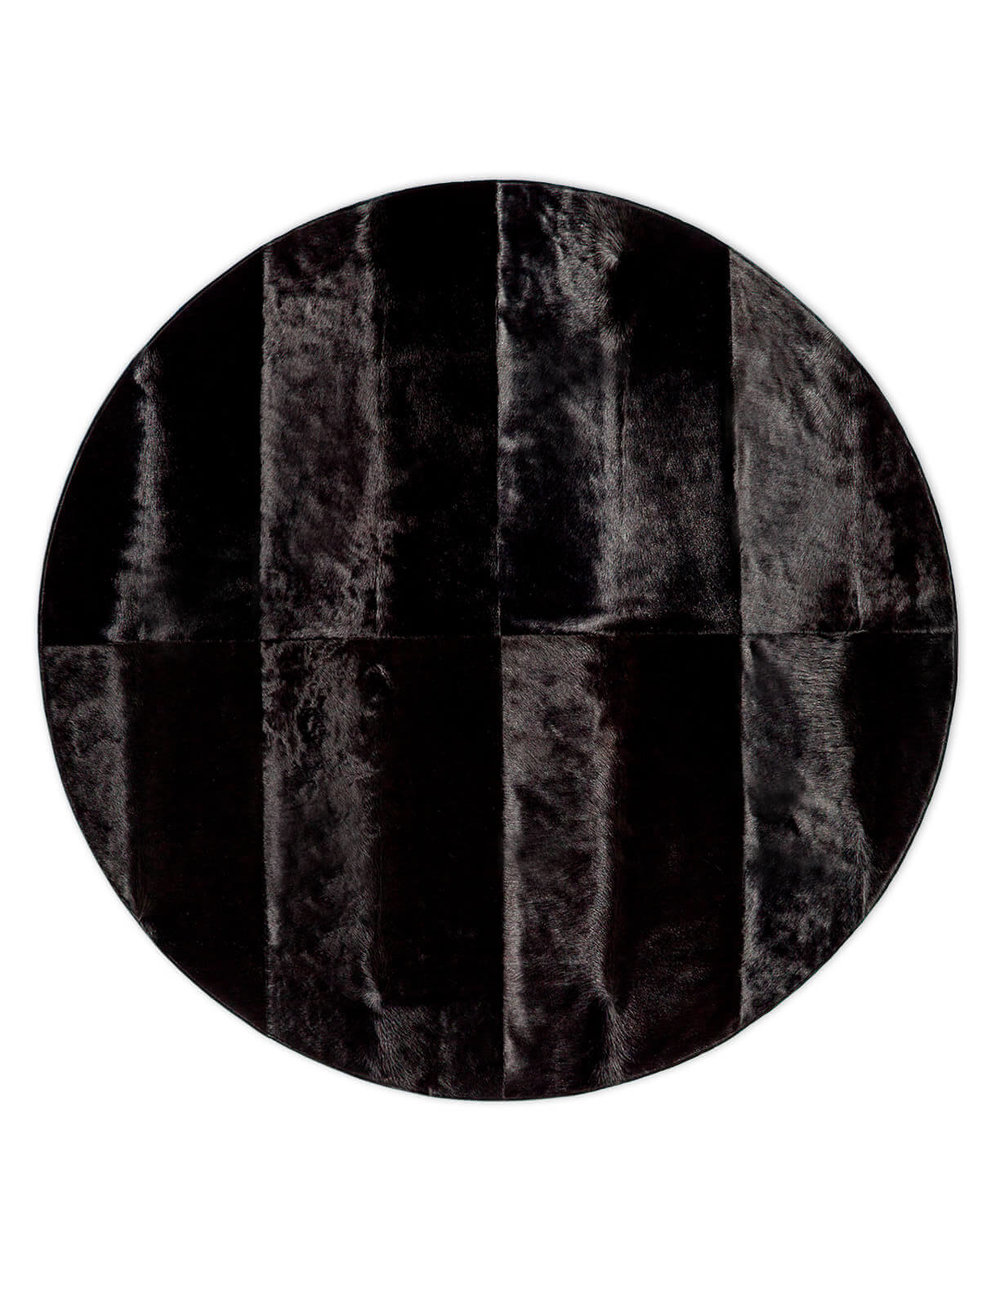 OAK ROUND  IN BLACK